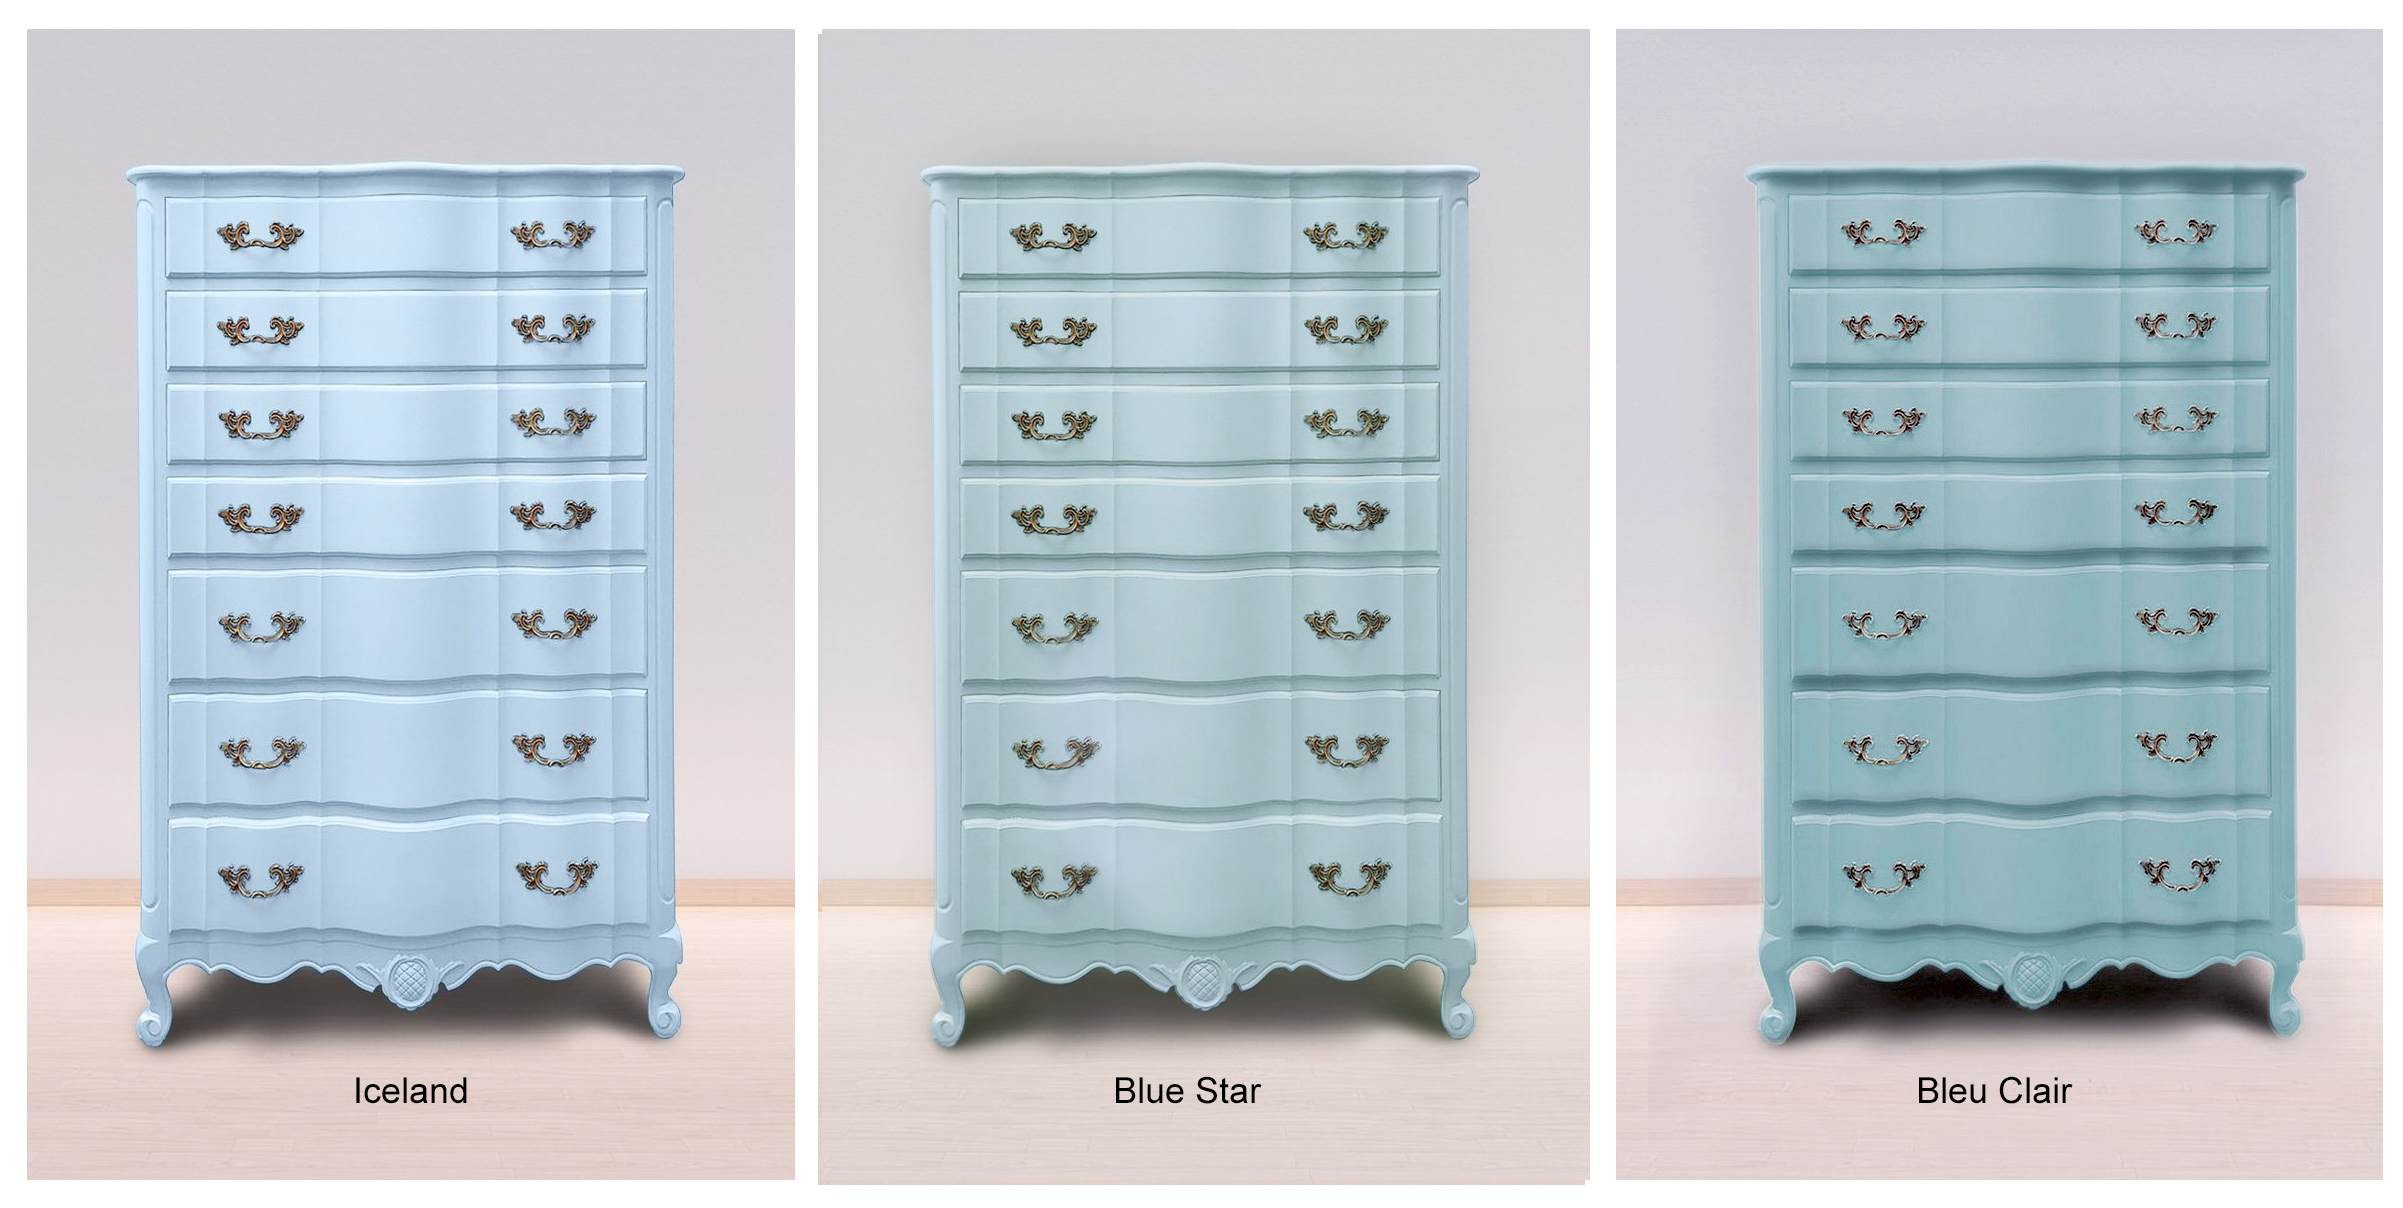 Iceland, Blue Star & Bleu Clair